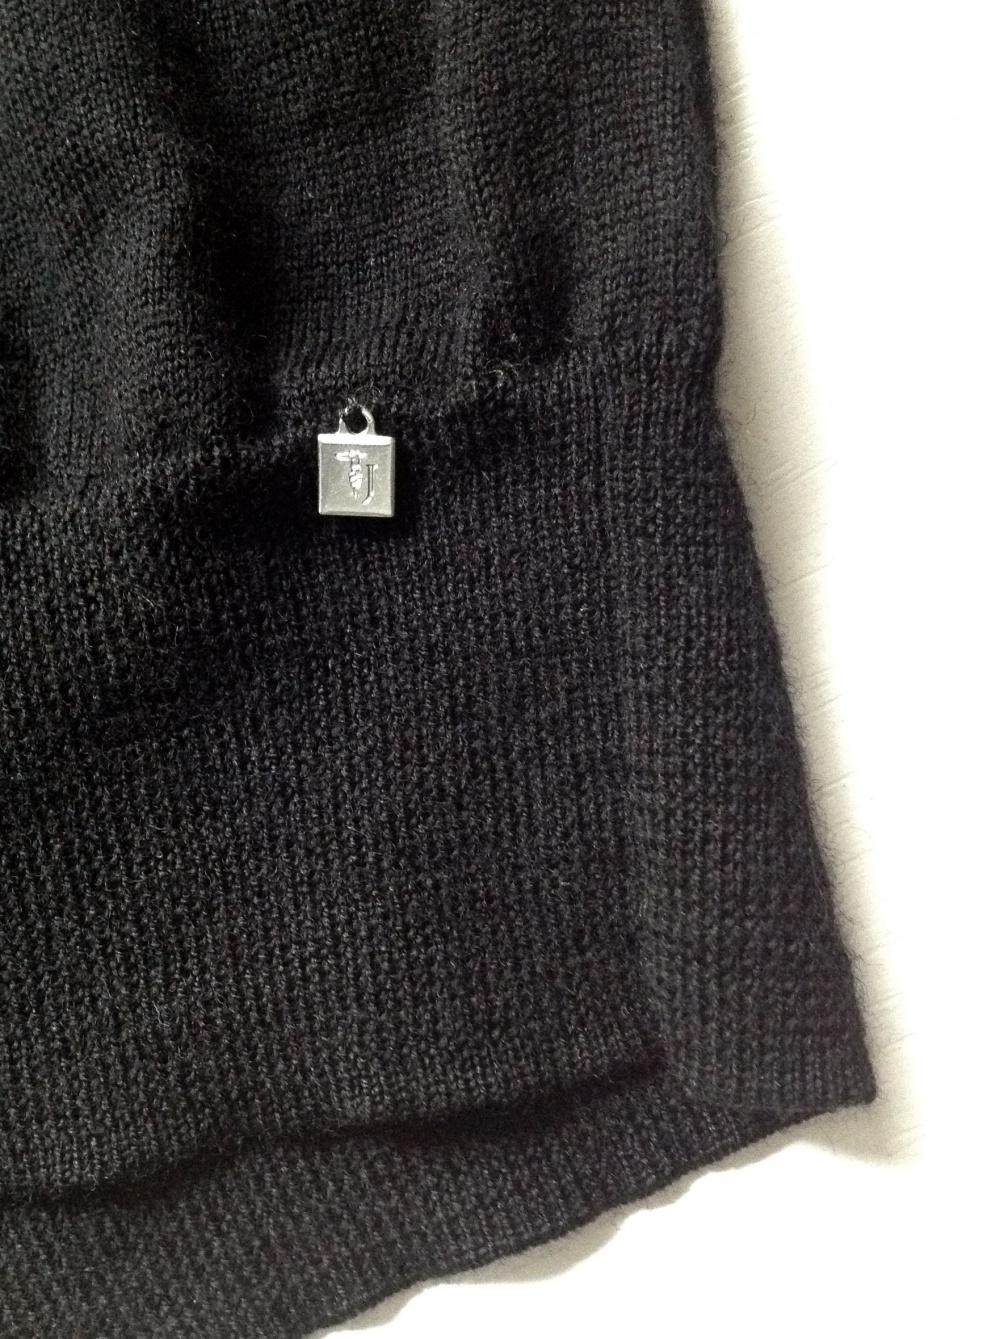 Кардиган Trussardi Jeans, размер 44-46.